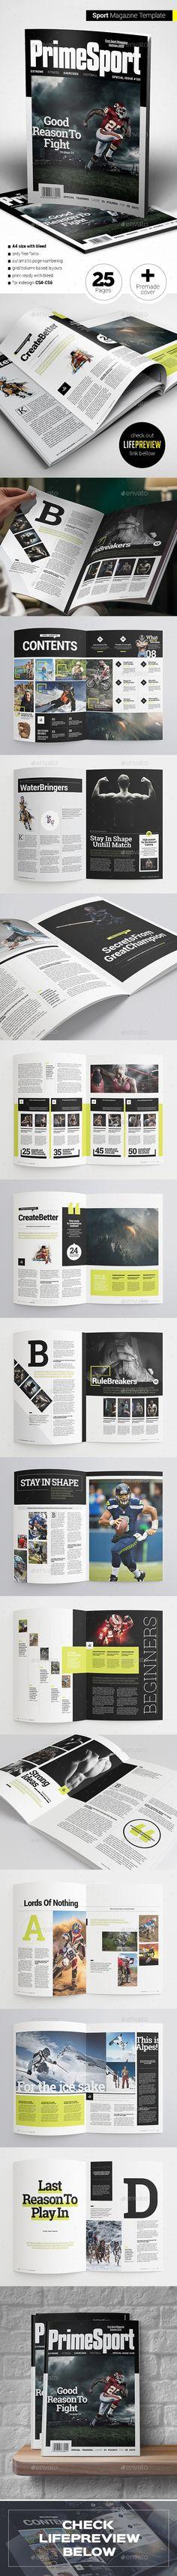 Sport Magazine Template InDesign INDD. Download here: http://graphicriver.net/item/sport-magazine/15932541?ref=ksioks